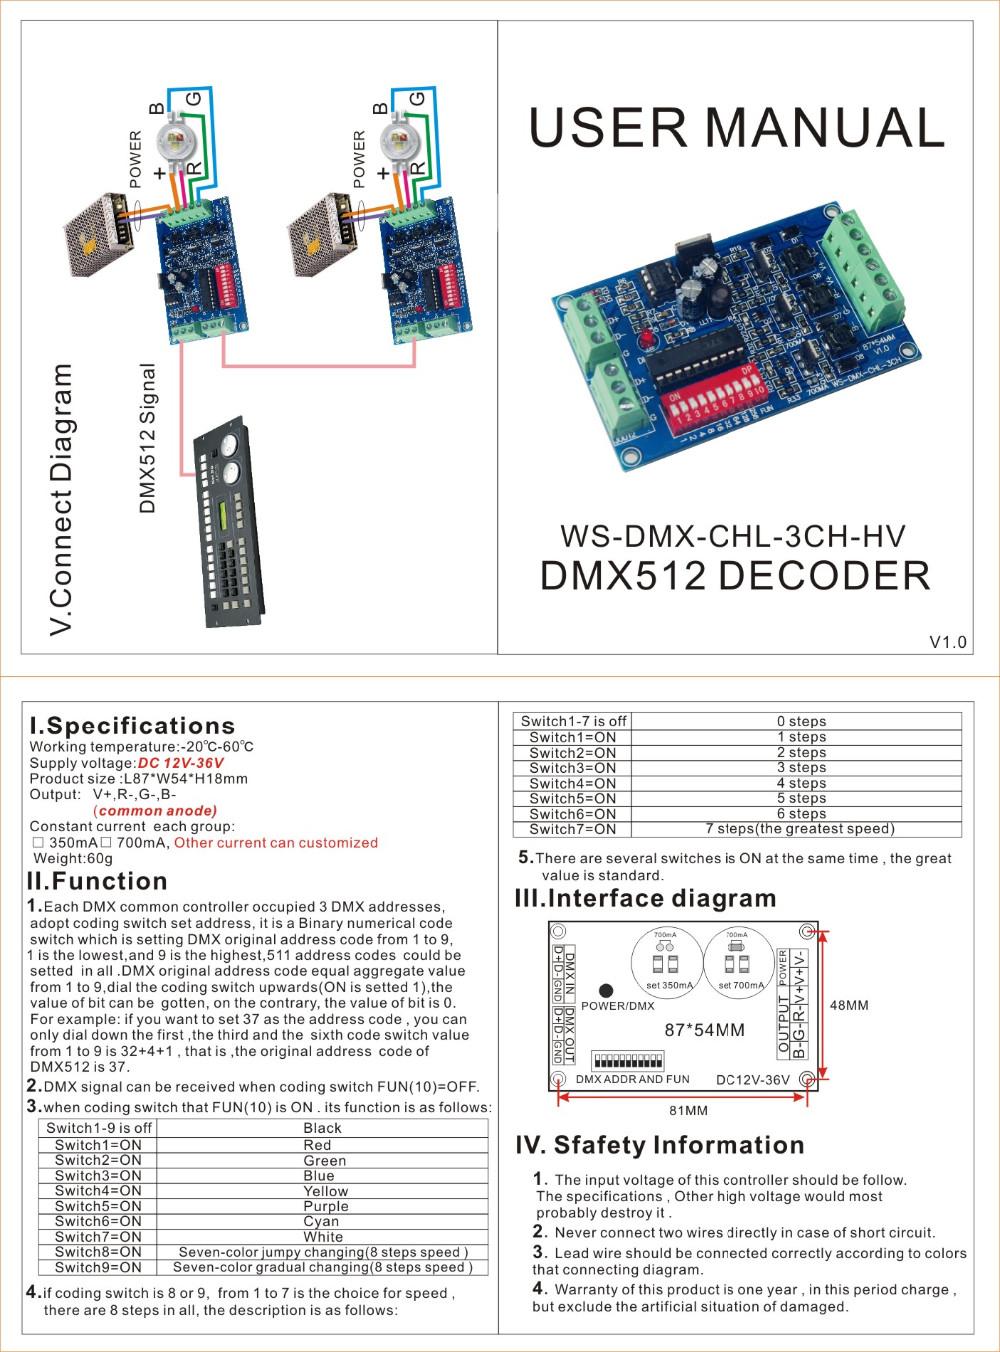 DMX_Controller_WS_DMX_CHL_3CH_HV_350MA_1